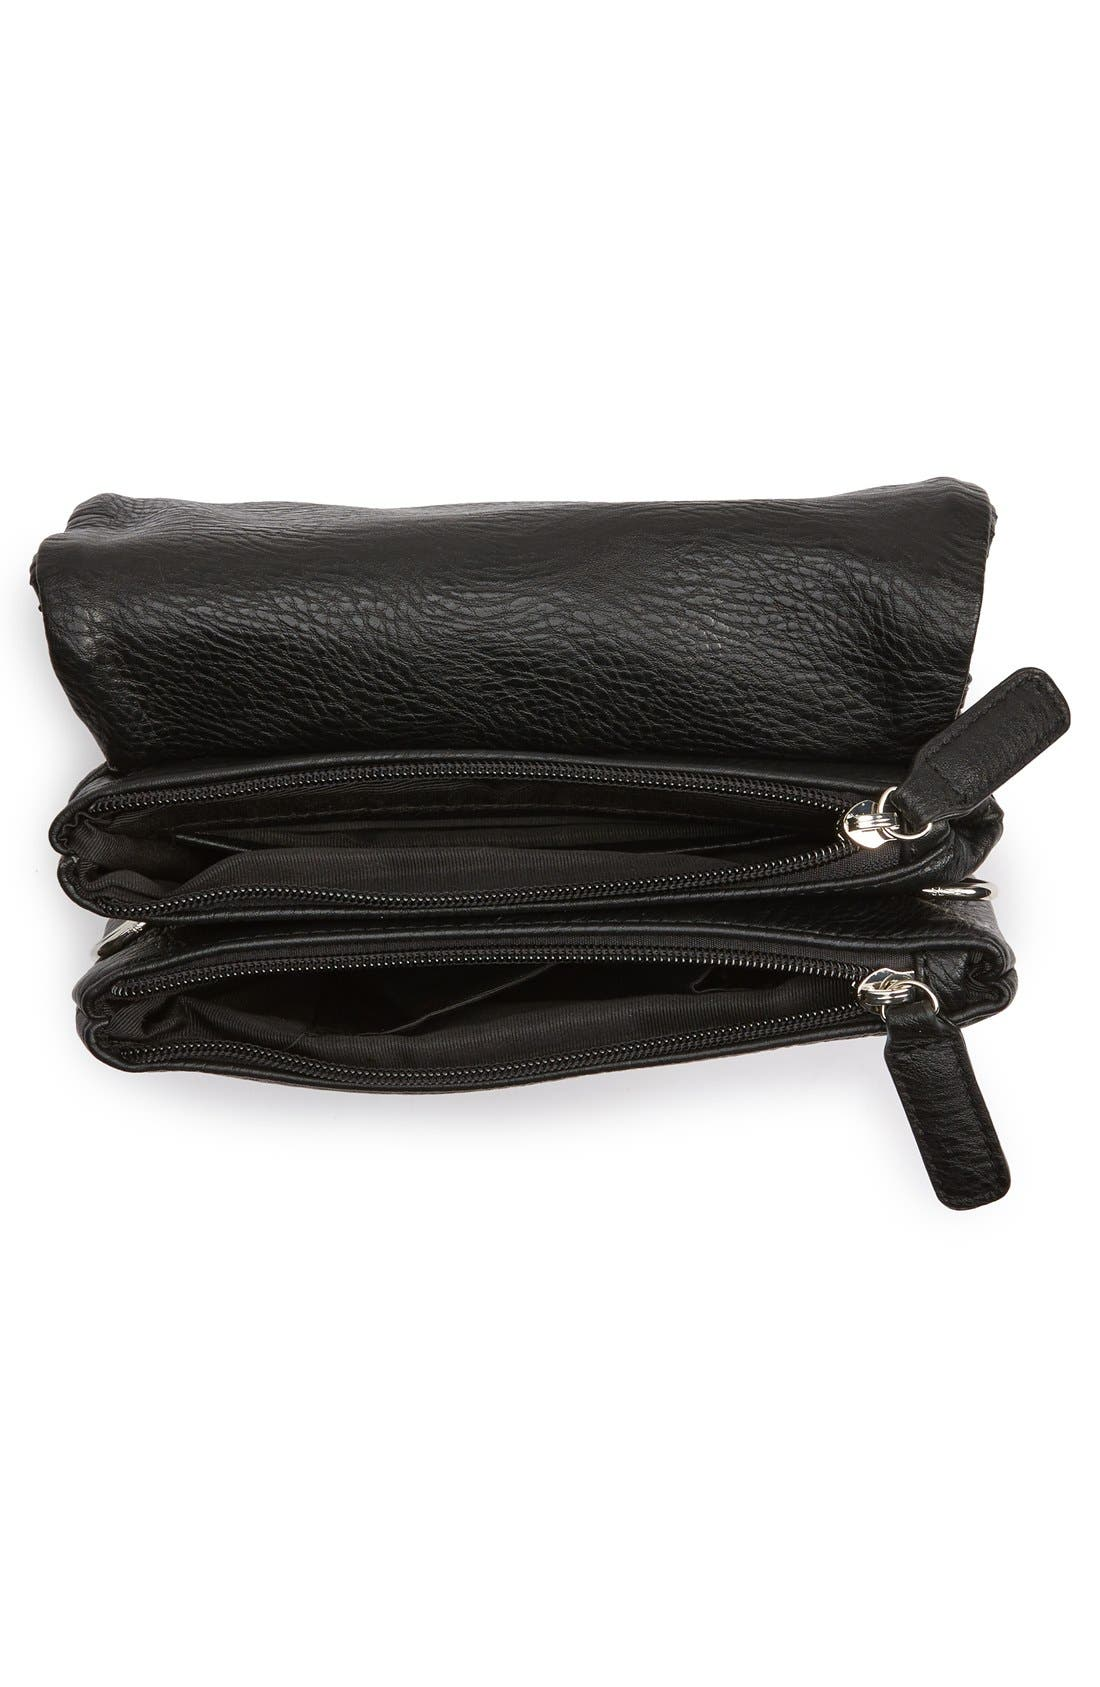 Woven Faux Leather Crossbody Bag,                             Alternate thumbnail 2, color,                             001